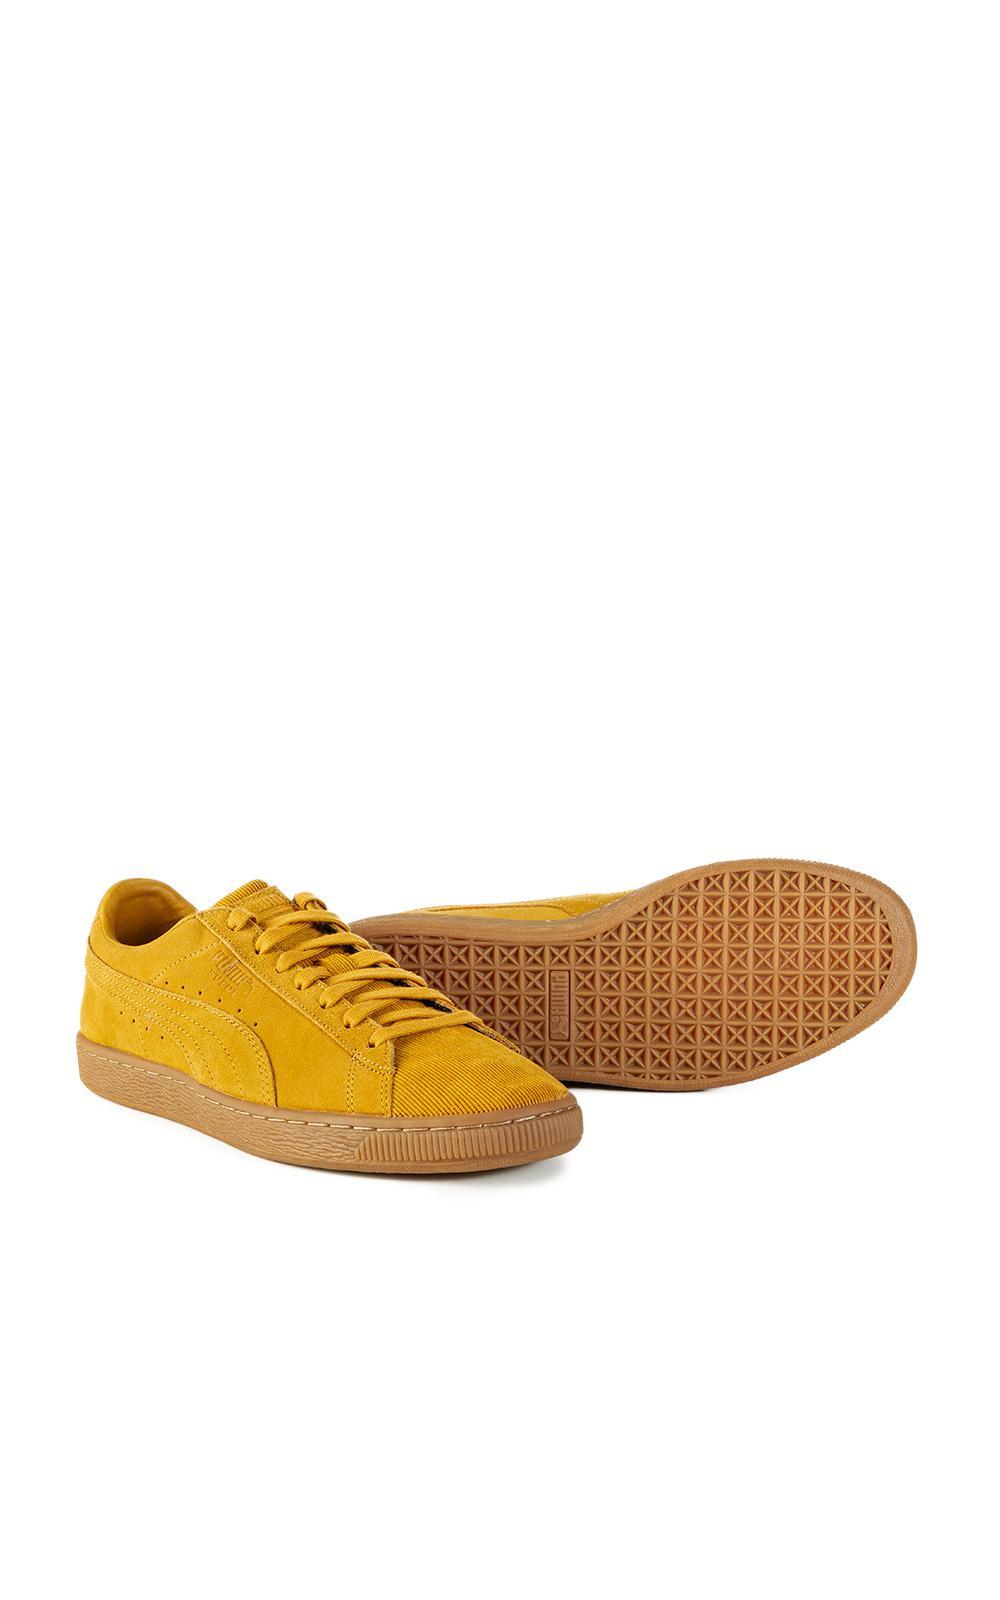 PUMA - Suede Classic Pincord brown for Men - Lyst. View fullscreen febcff497